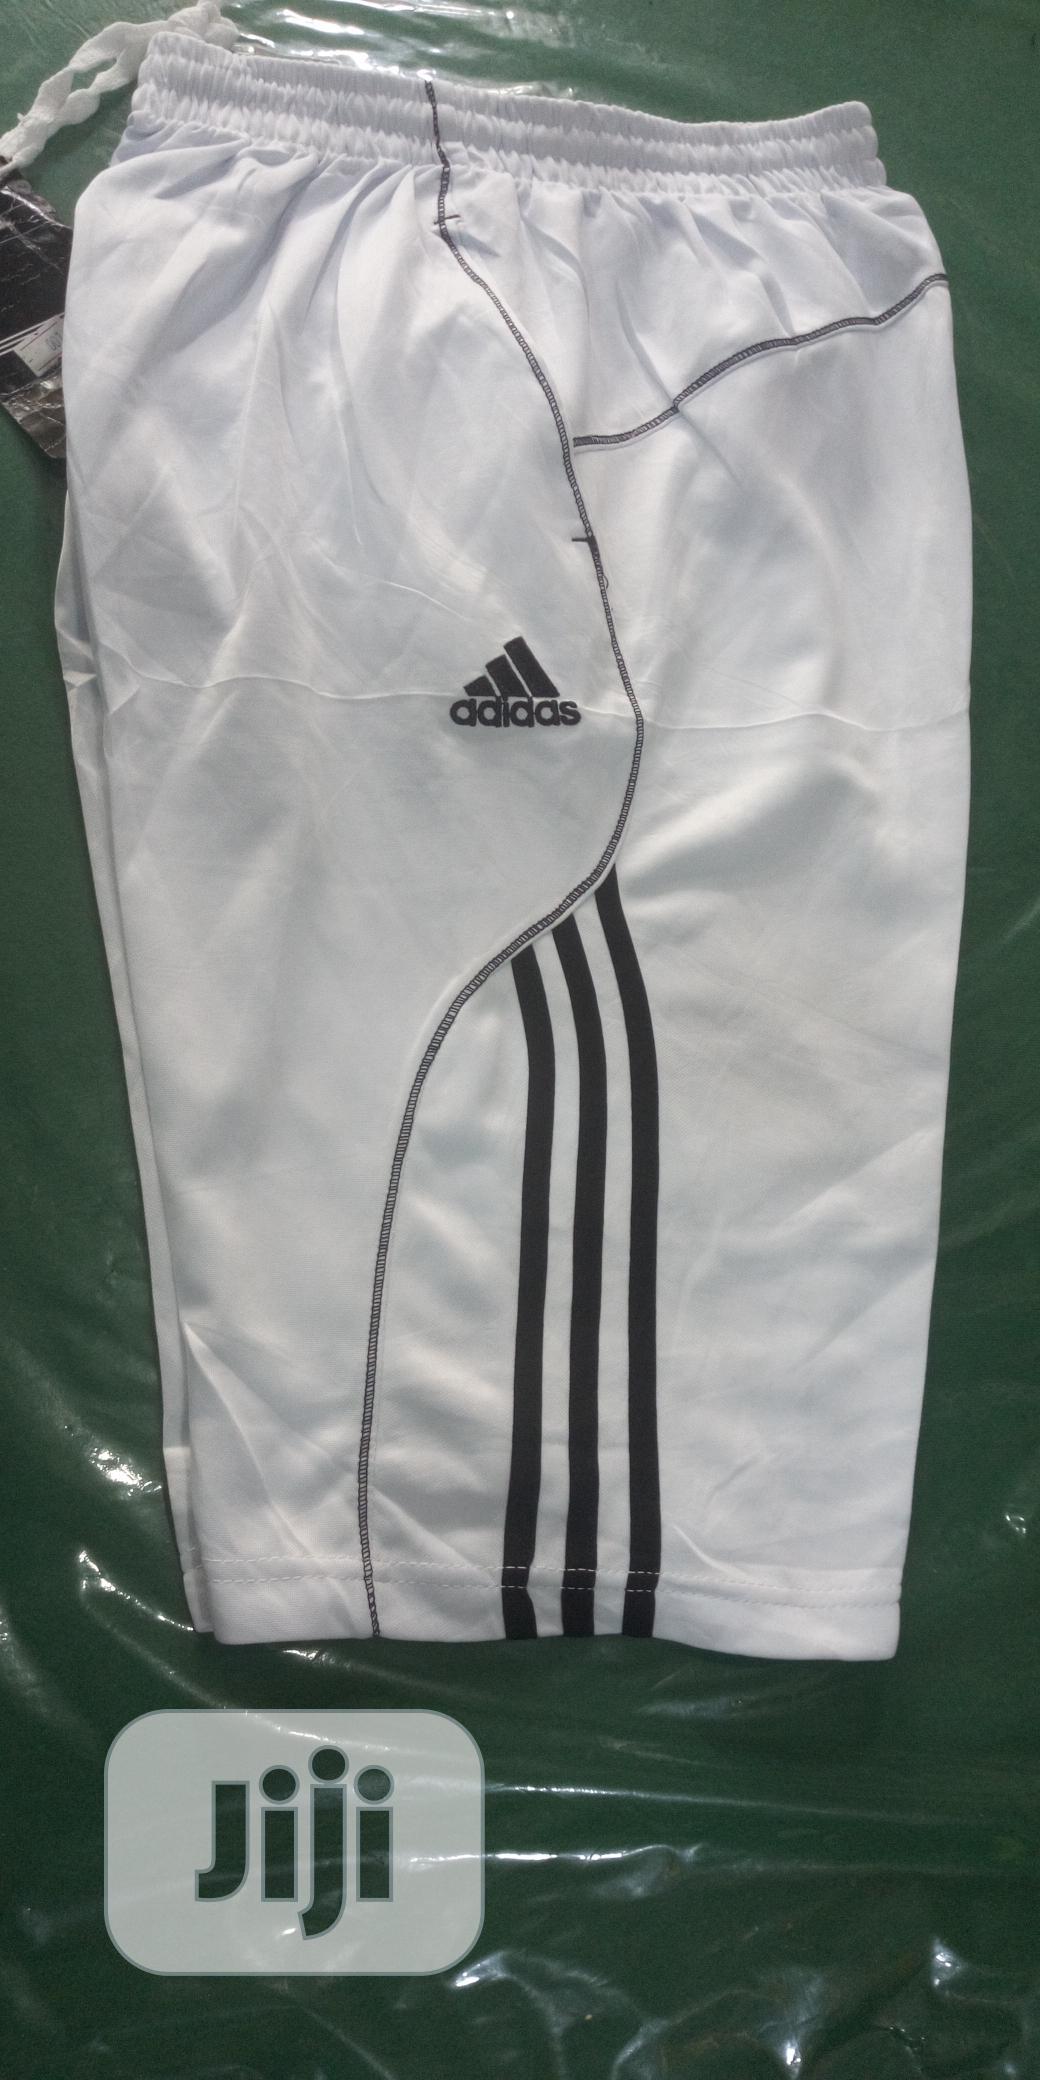 Archive: Adidas White Shorts